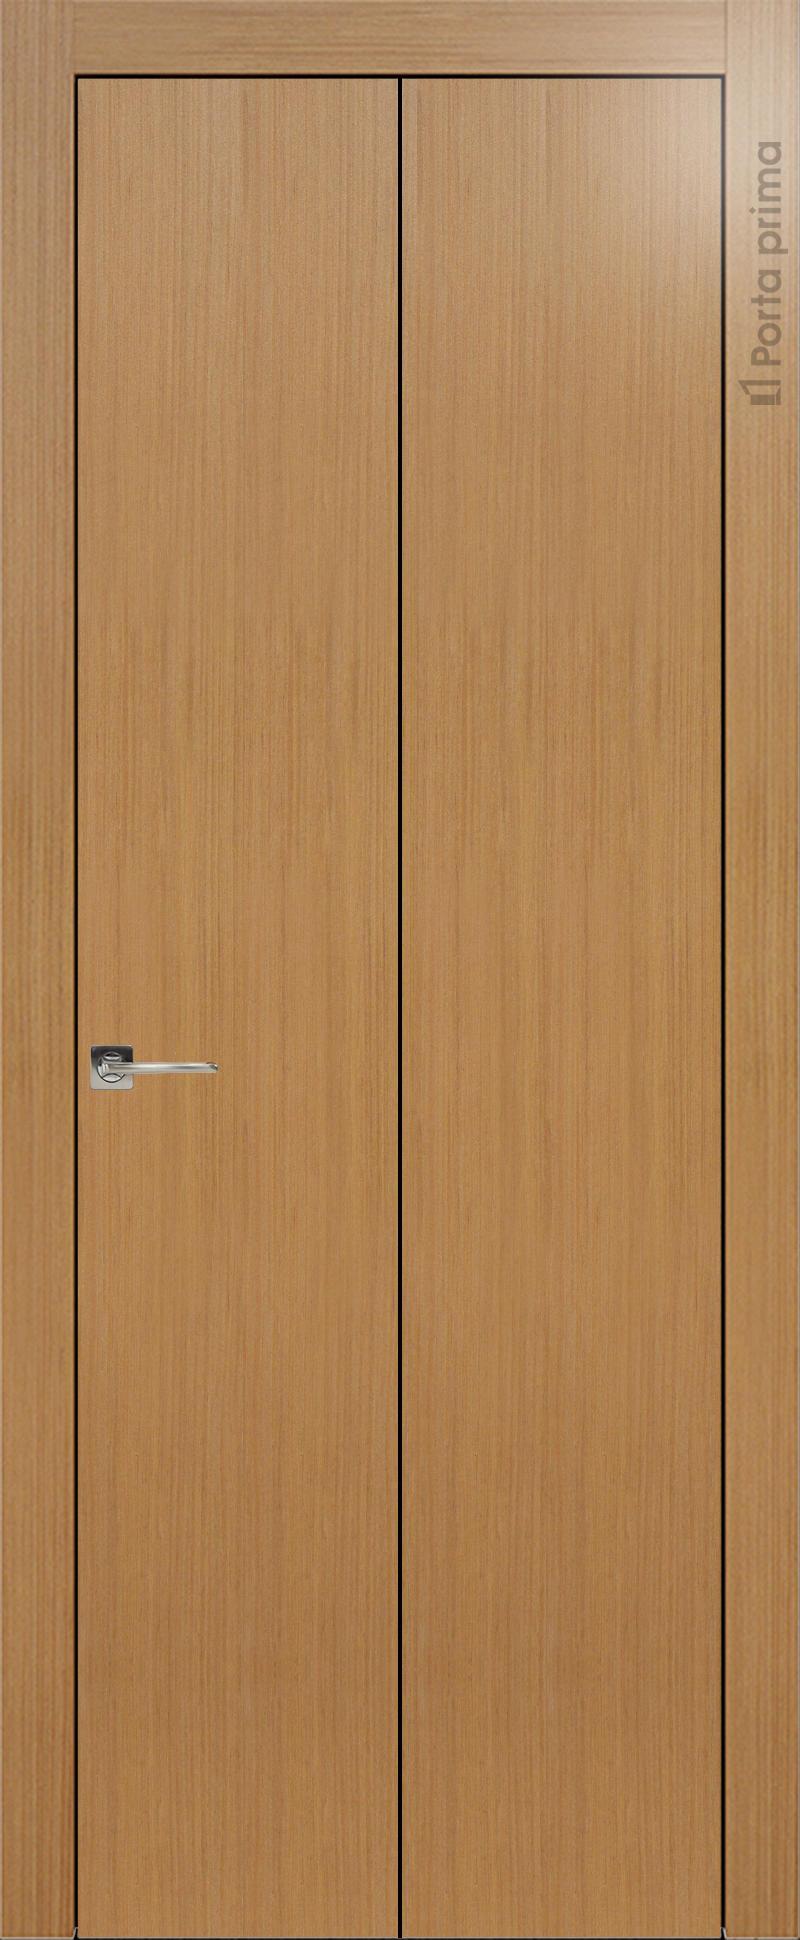 Tivoli А-1 Книжка цвет - Миланский орех Без стекла (ДГ)